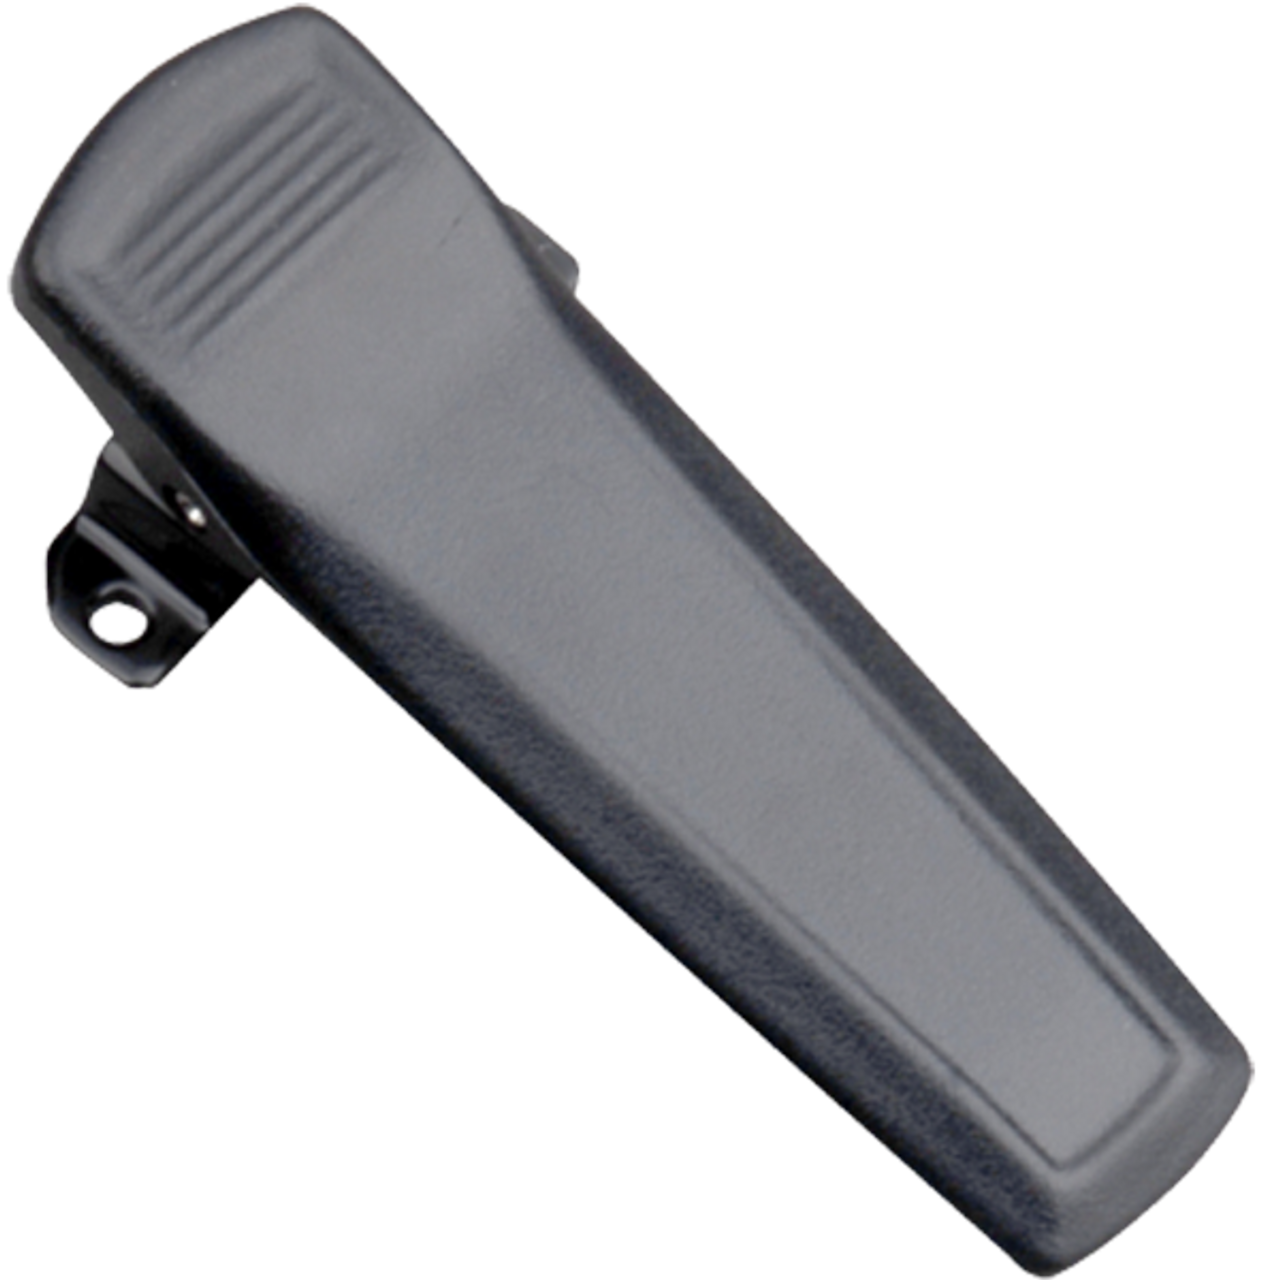 Hytera BC19 Standard Belt Clip